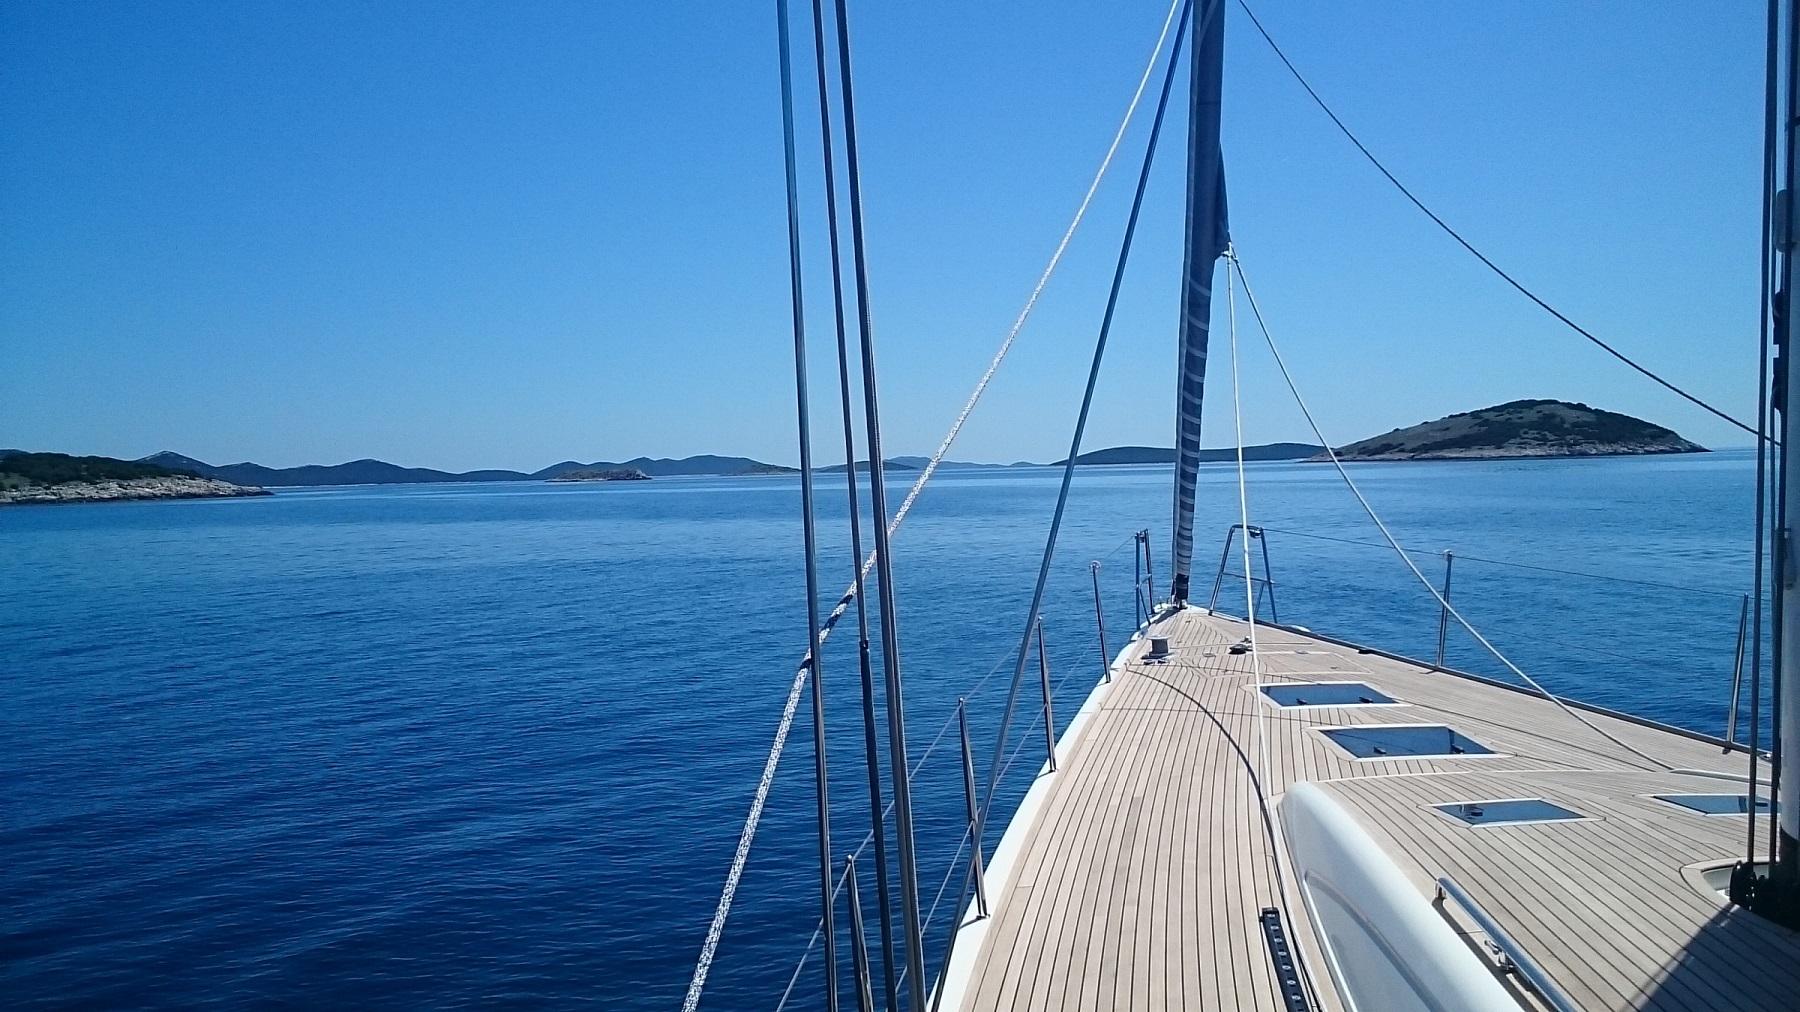 Photos Charter Eline X Yachts X65 Adria Yacht Design